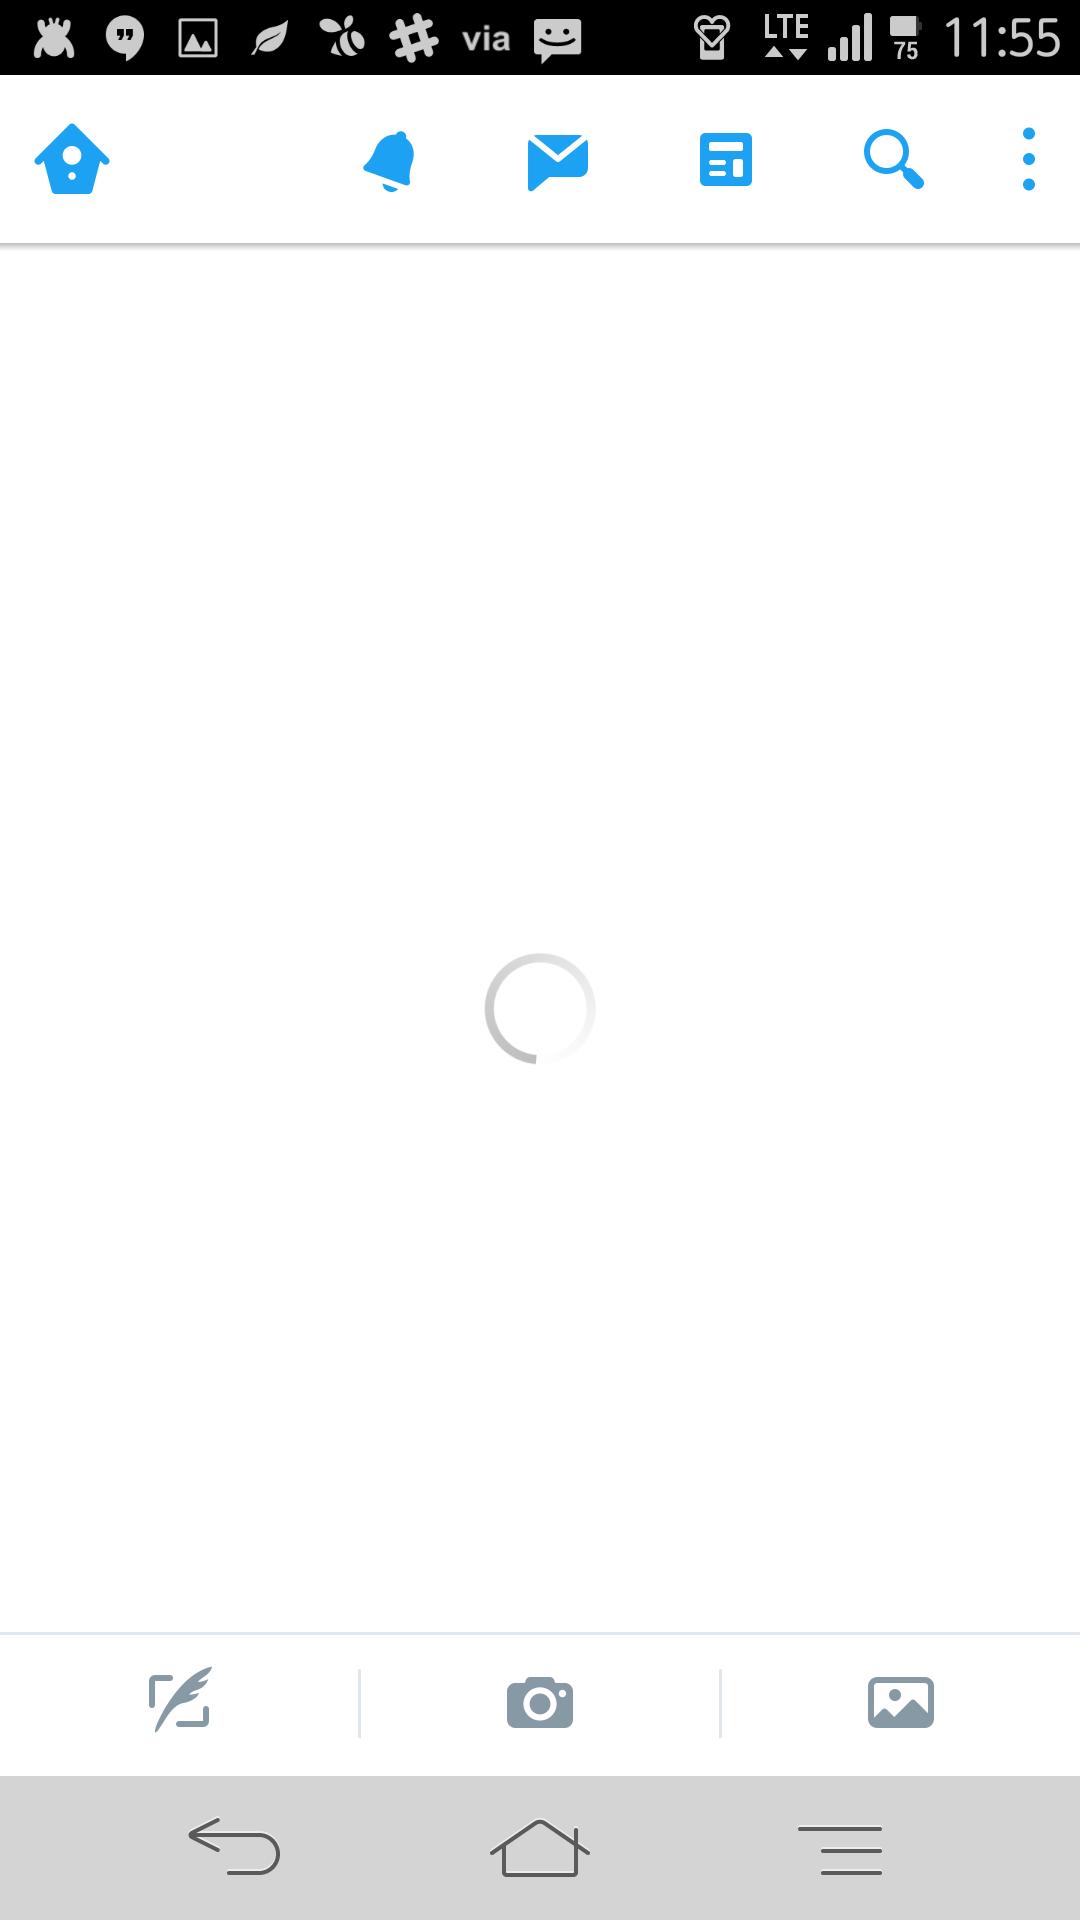 Screenshot_2015-11-11-11-55-35